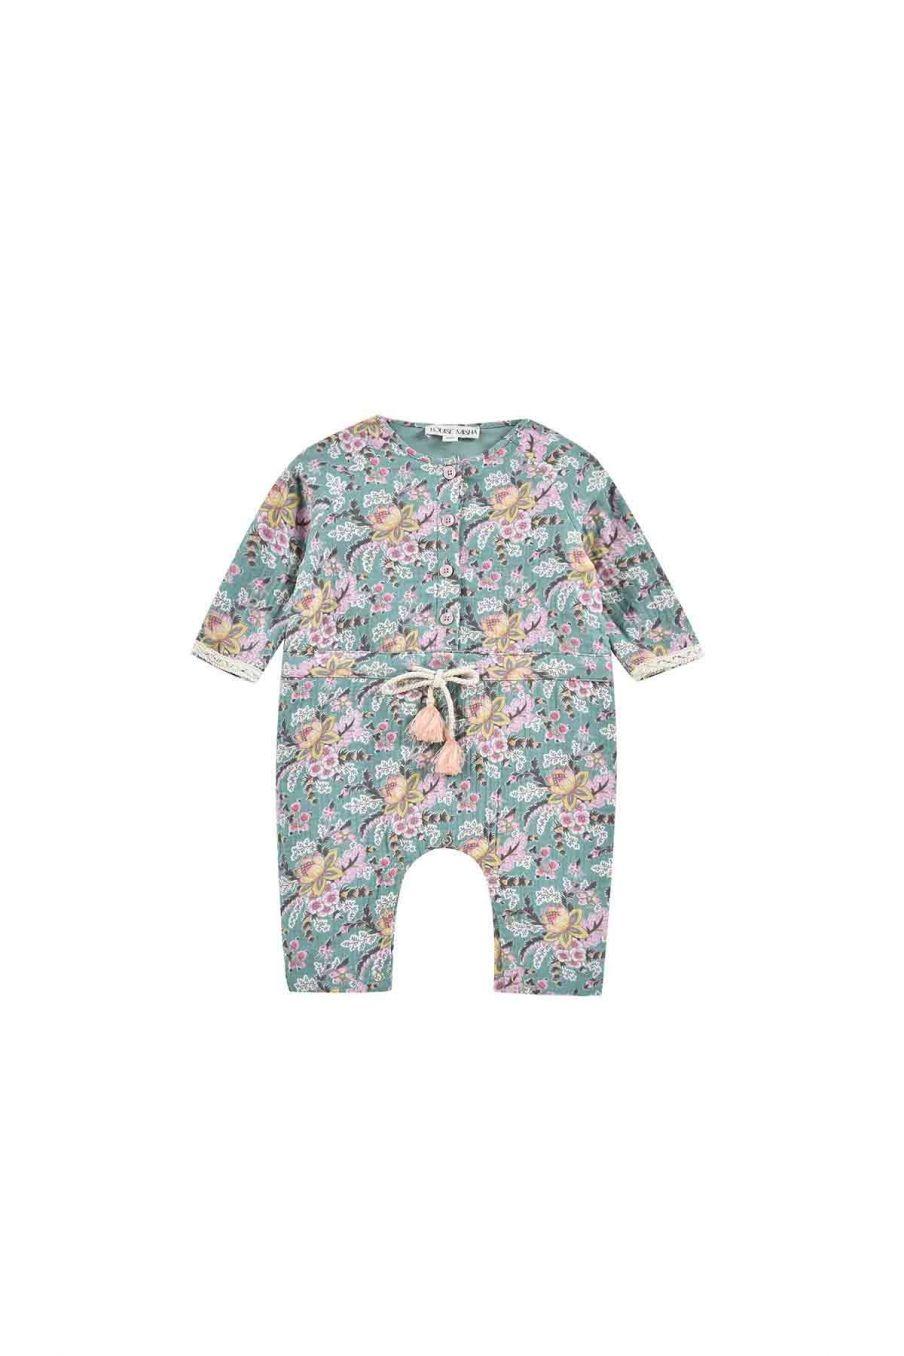 combinaison bebe fille jenna blue french flowers - louise misha